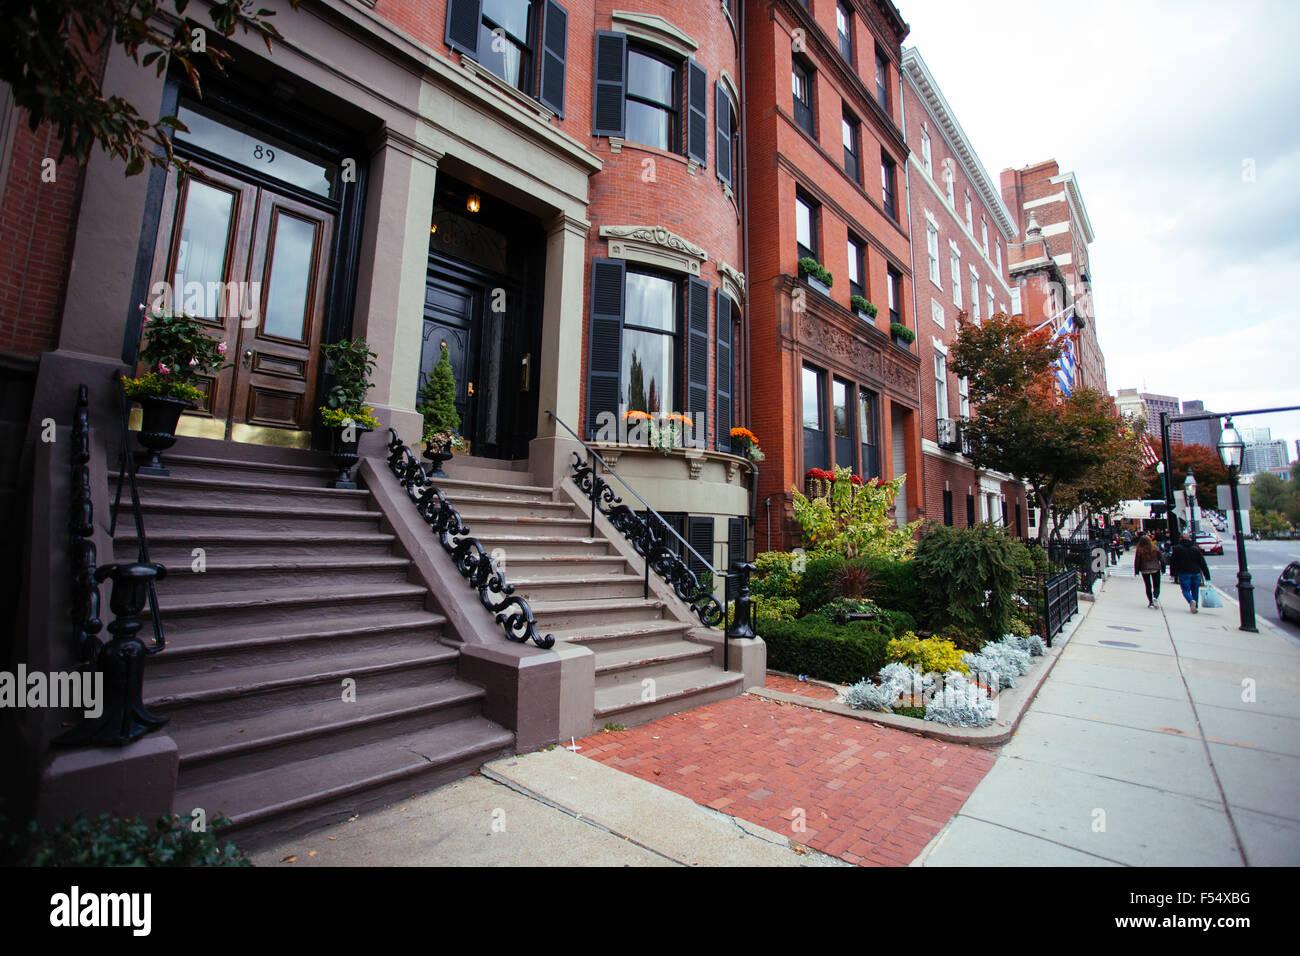 boston old brick buildings - Stock Image